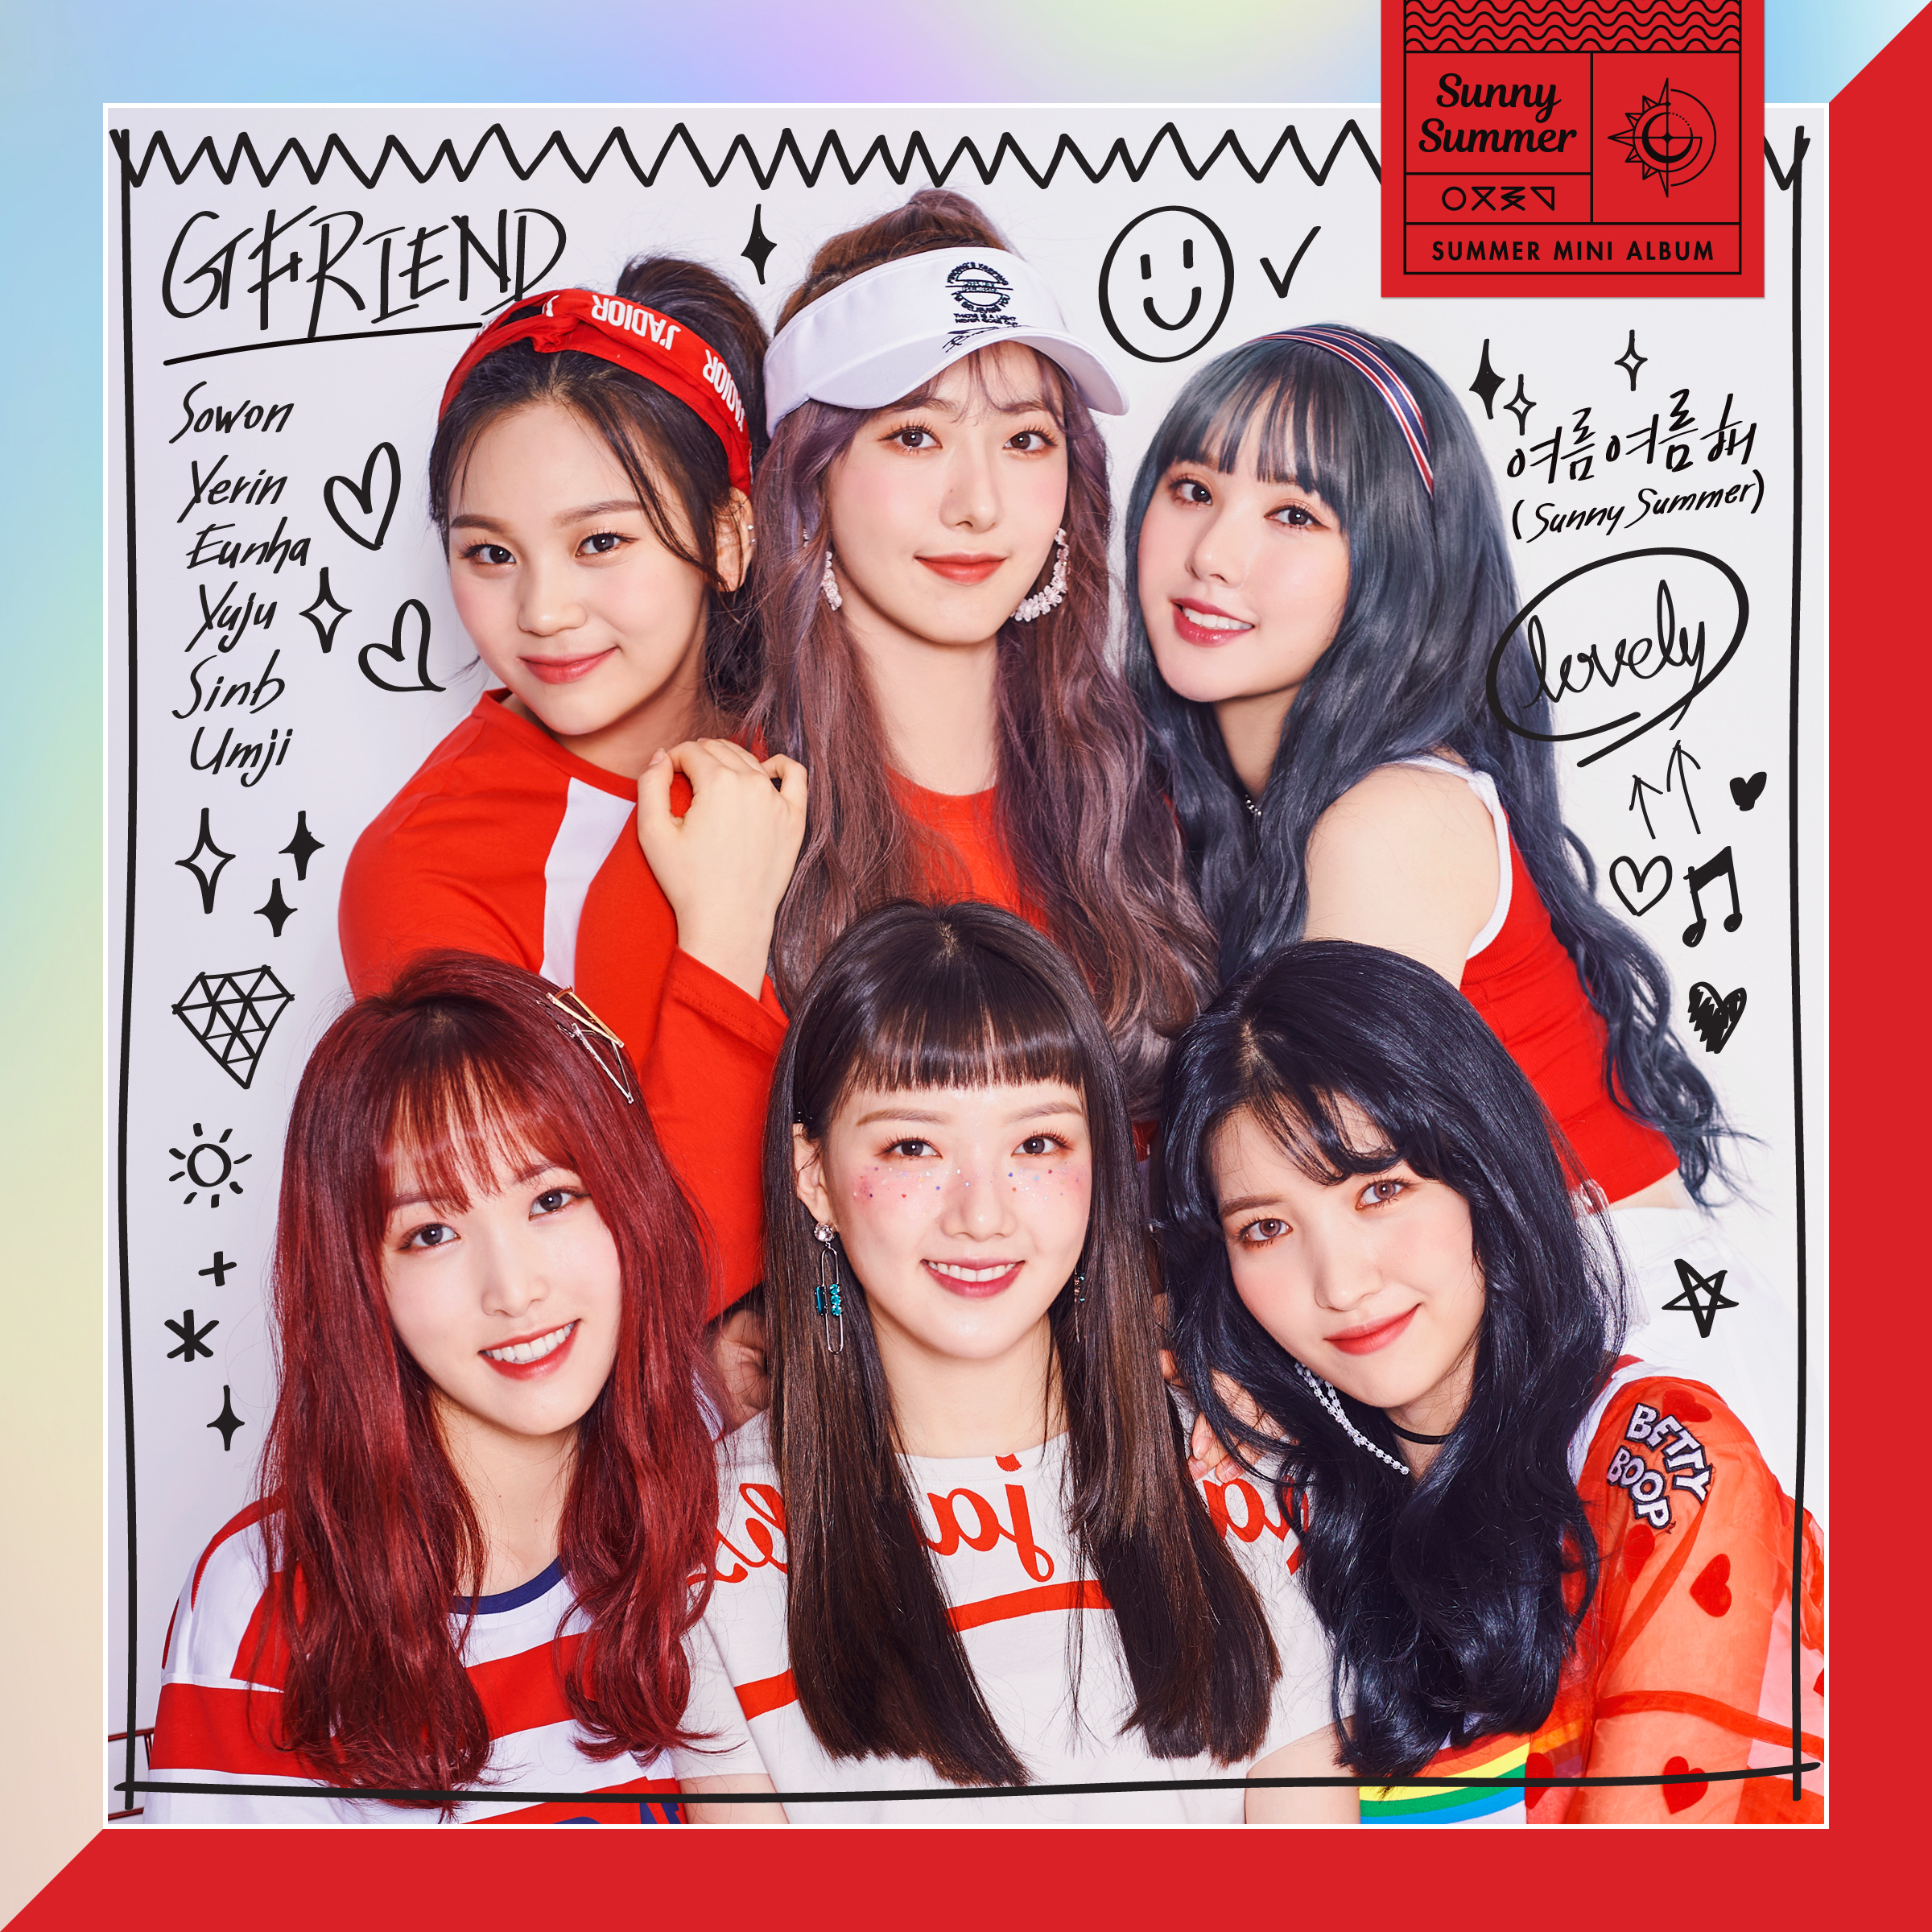 20180720.0219.2 GFRIEND - Sunny Summer cover.jpg